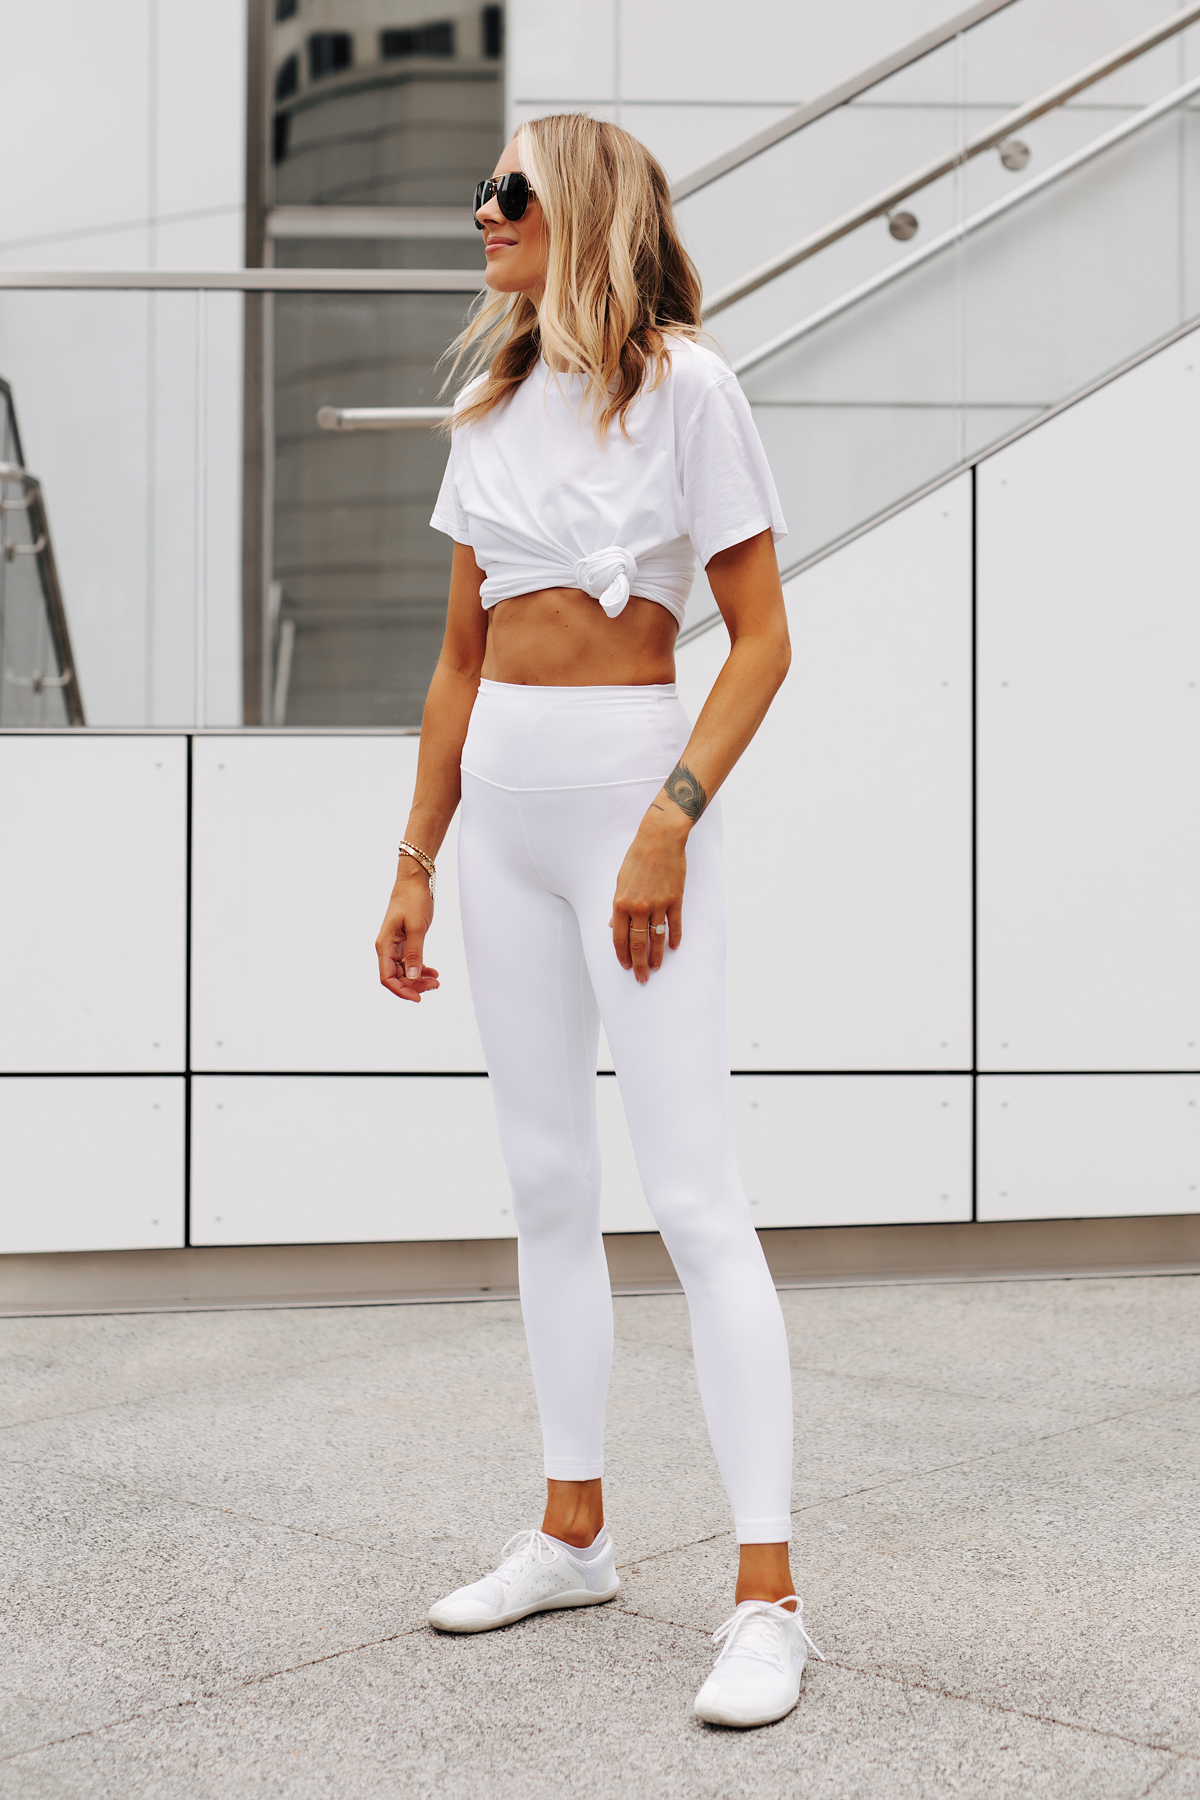 Fashion Jackson Wearing lululemon White Tshirt lululemon White Align Leggings White Sneakers